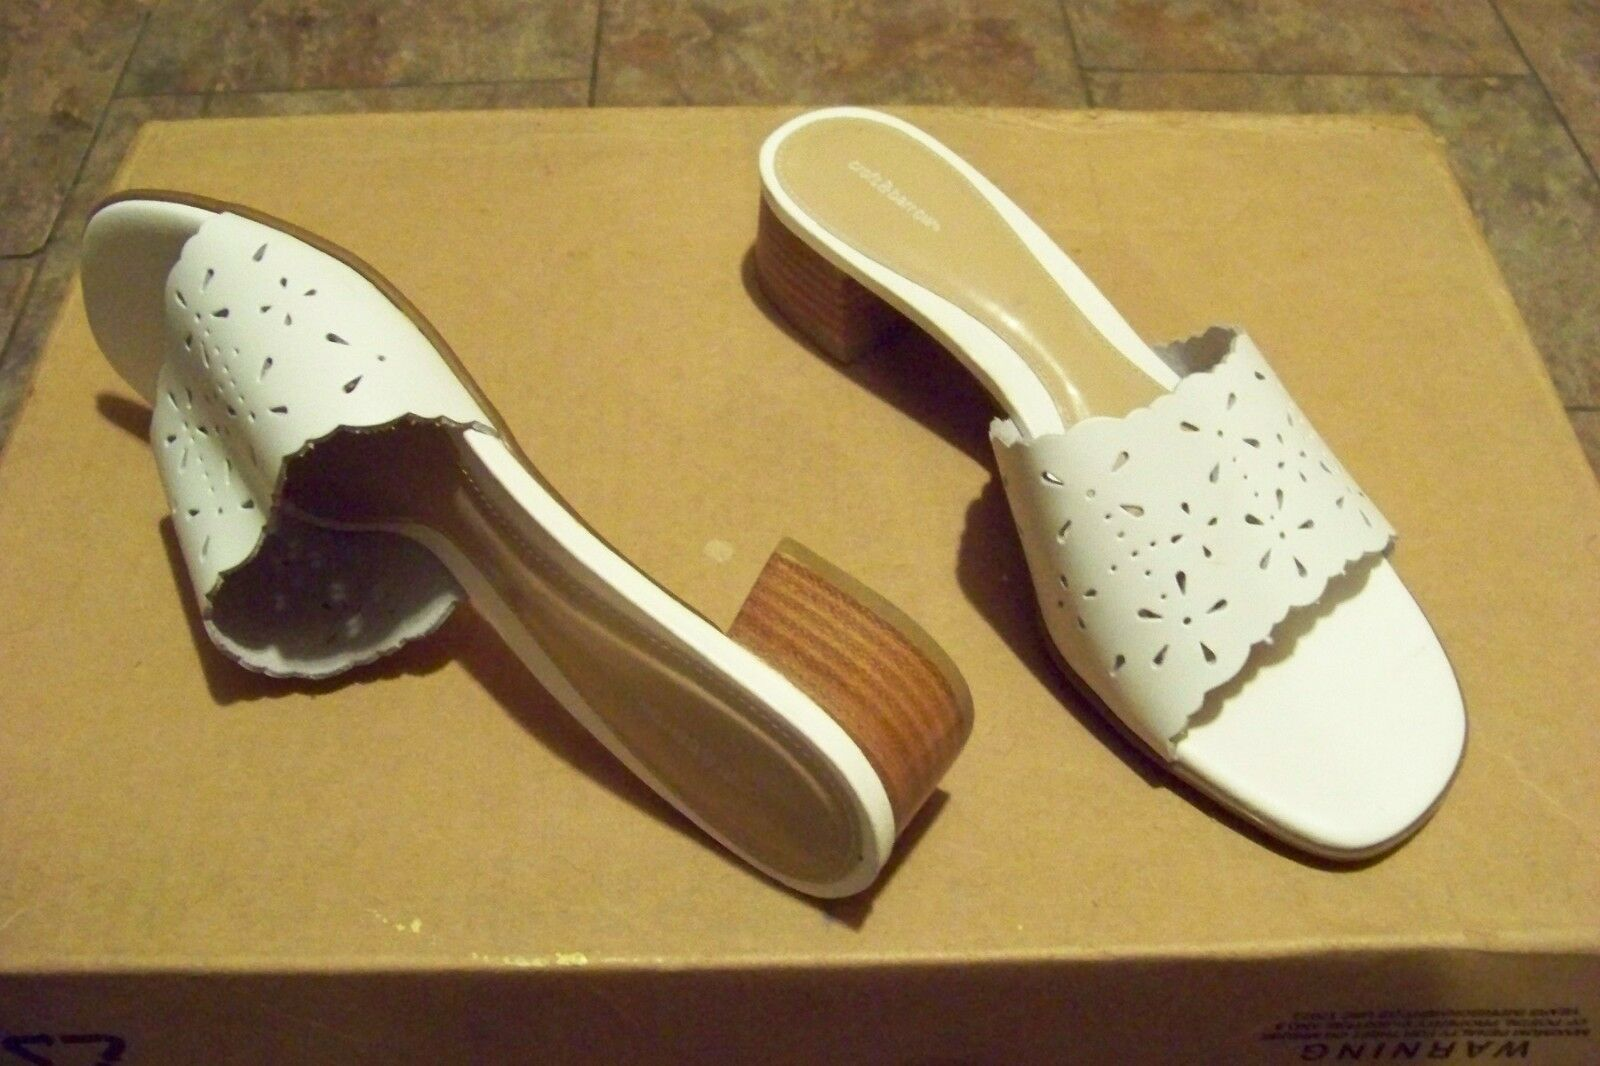 womens croft cut & barrow carrie white cut croft out strap heels shoes size 9 1/2 02fa45